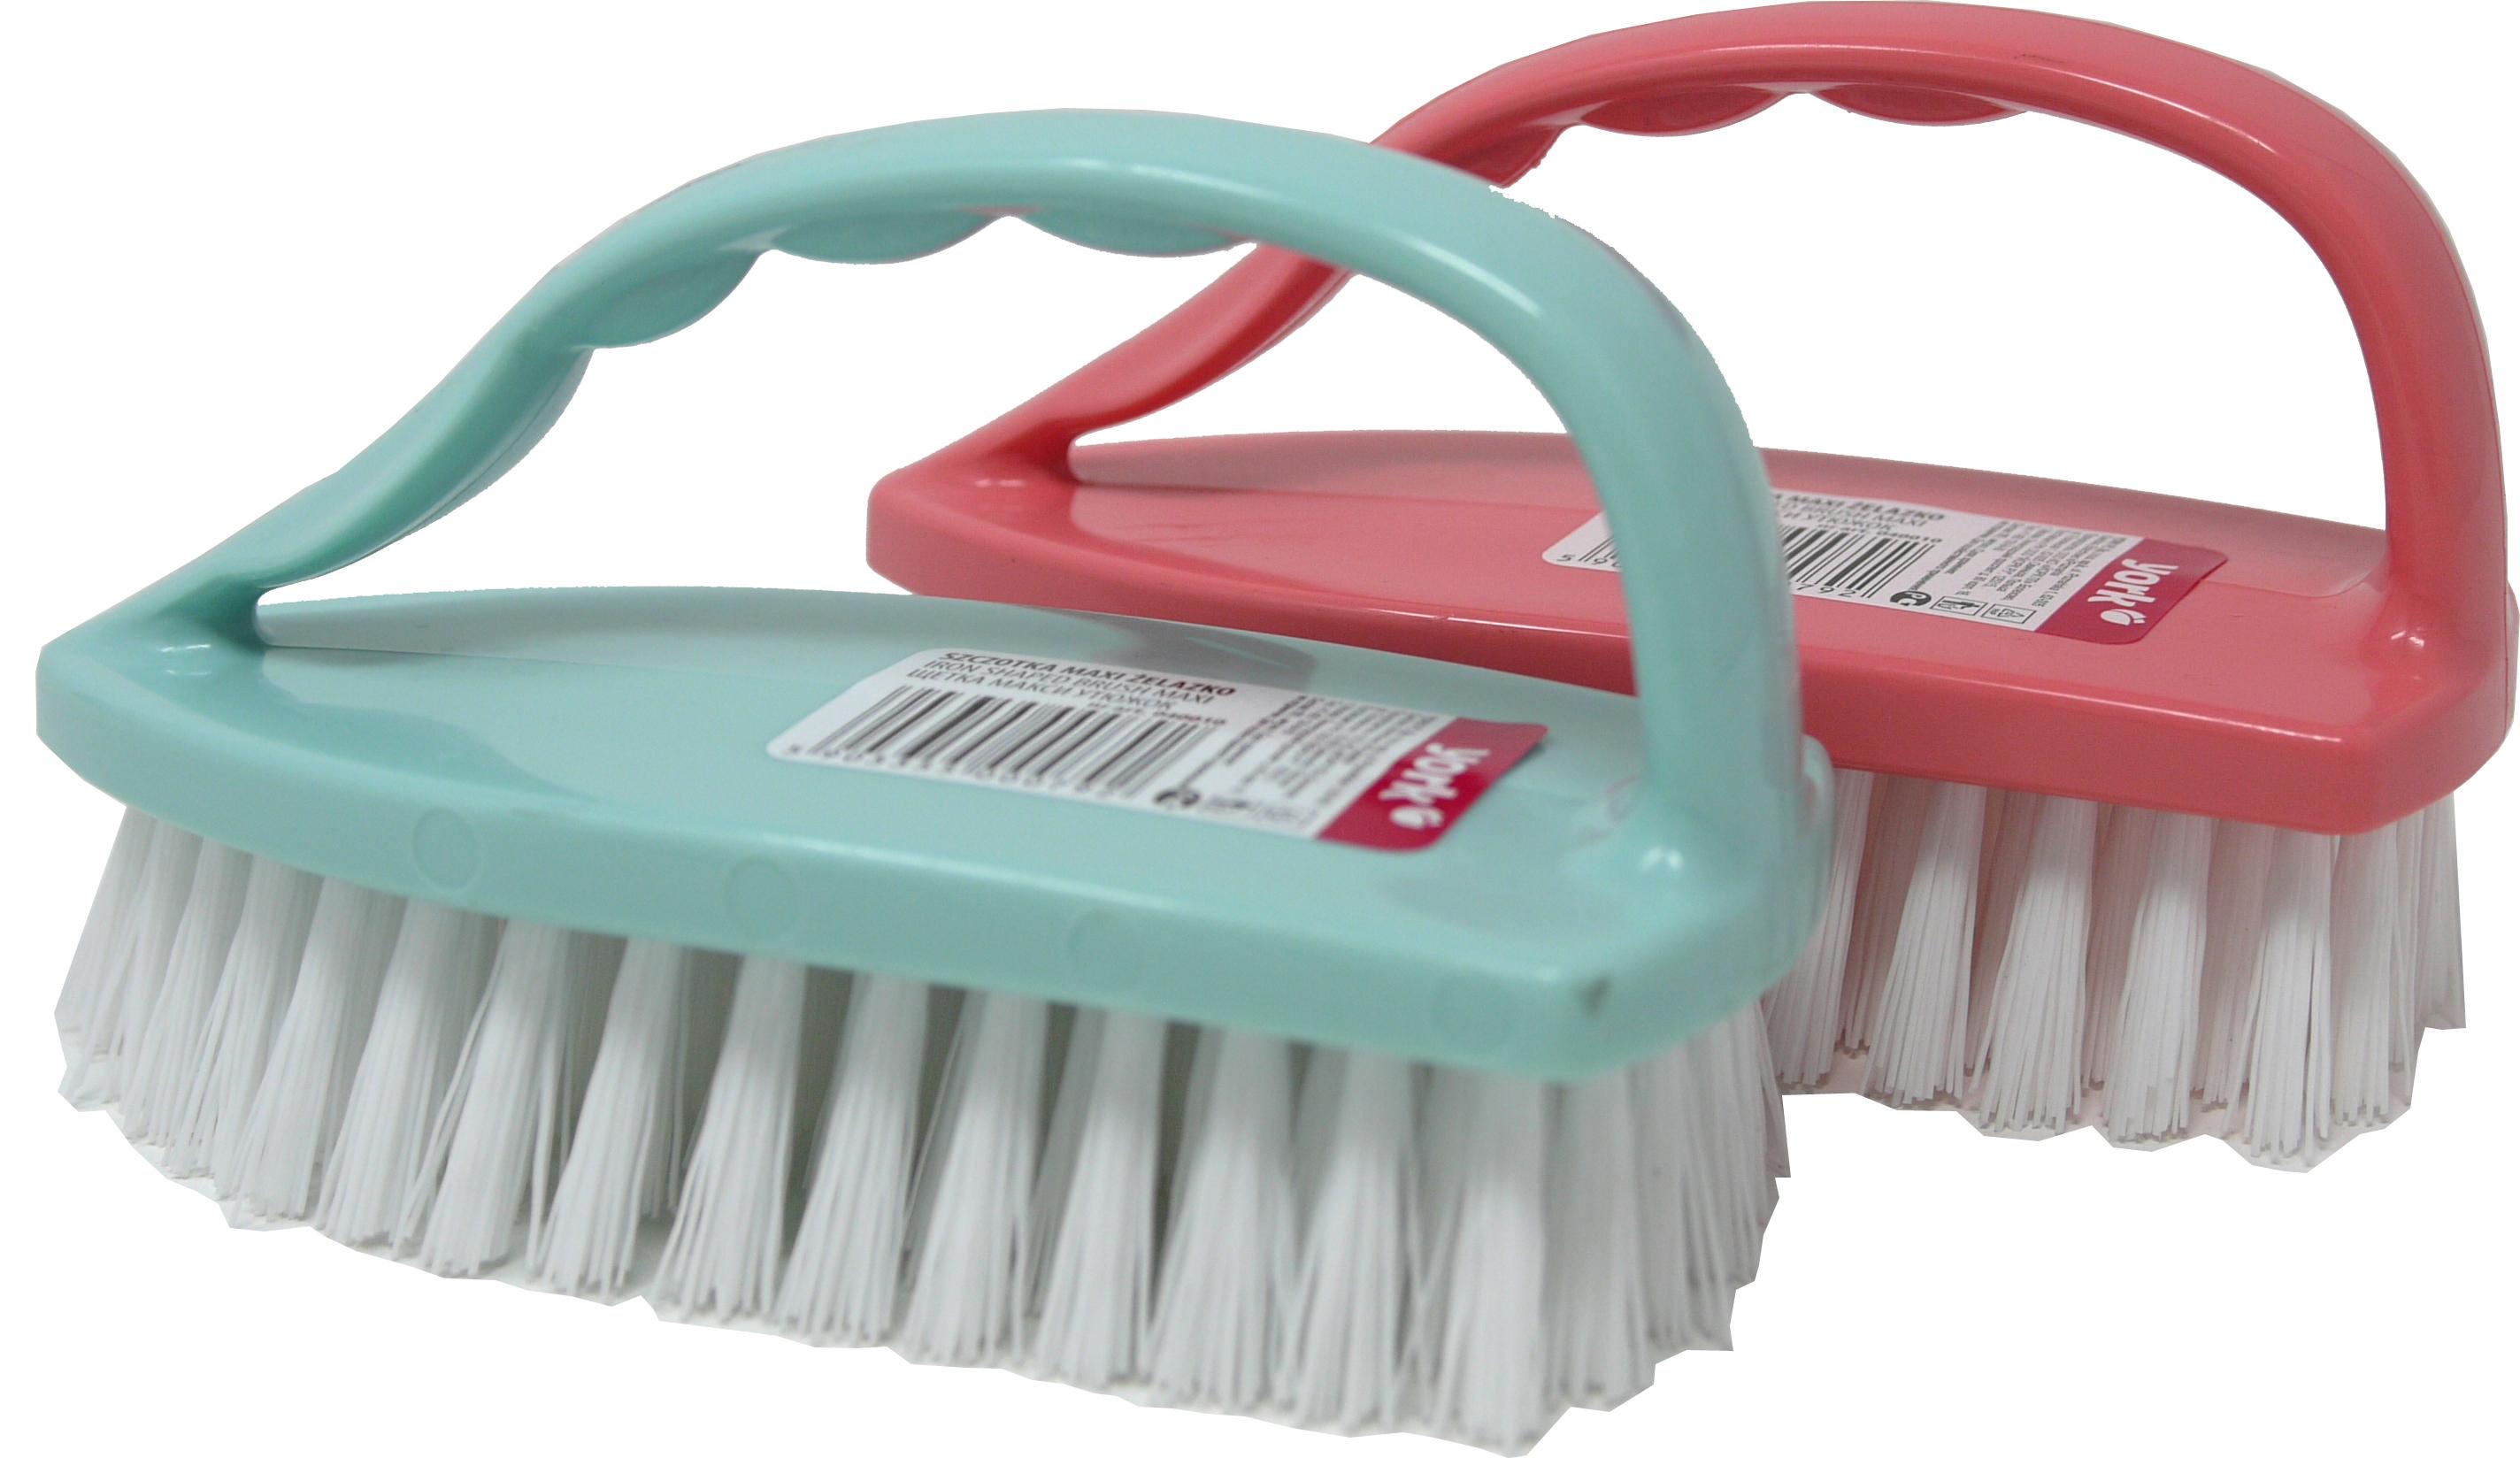 02302 - Handschrubber mit Griff, Kunststoff, 6x14cm, farbig sortiert